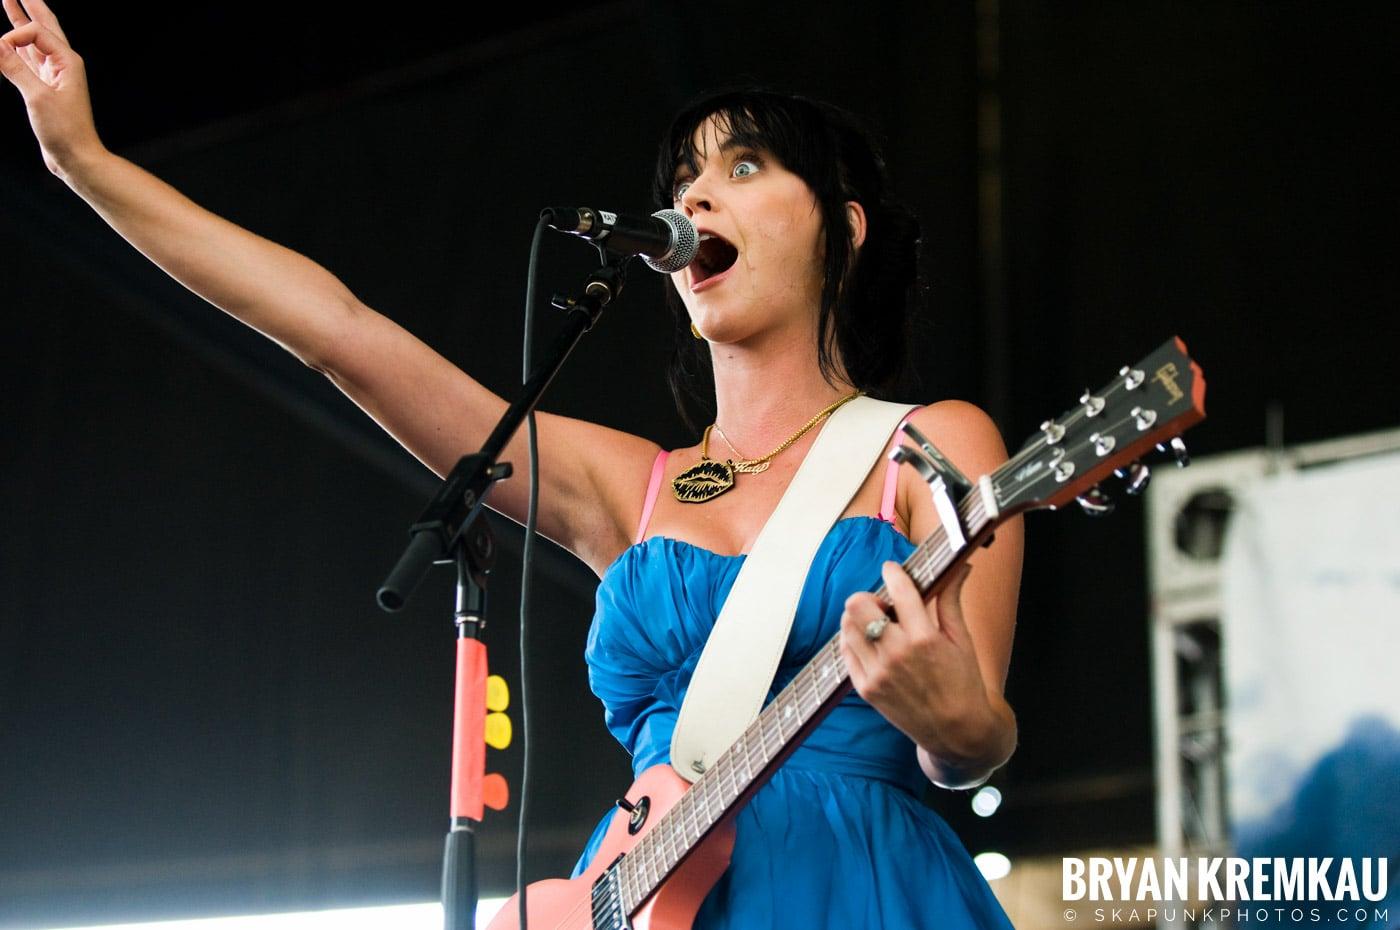 Katy Perry @ Warped Tour, Scranton PA - 7.27.08 (7)